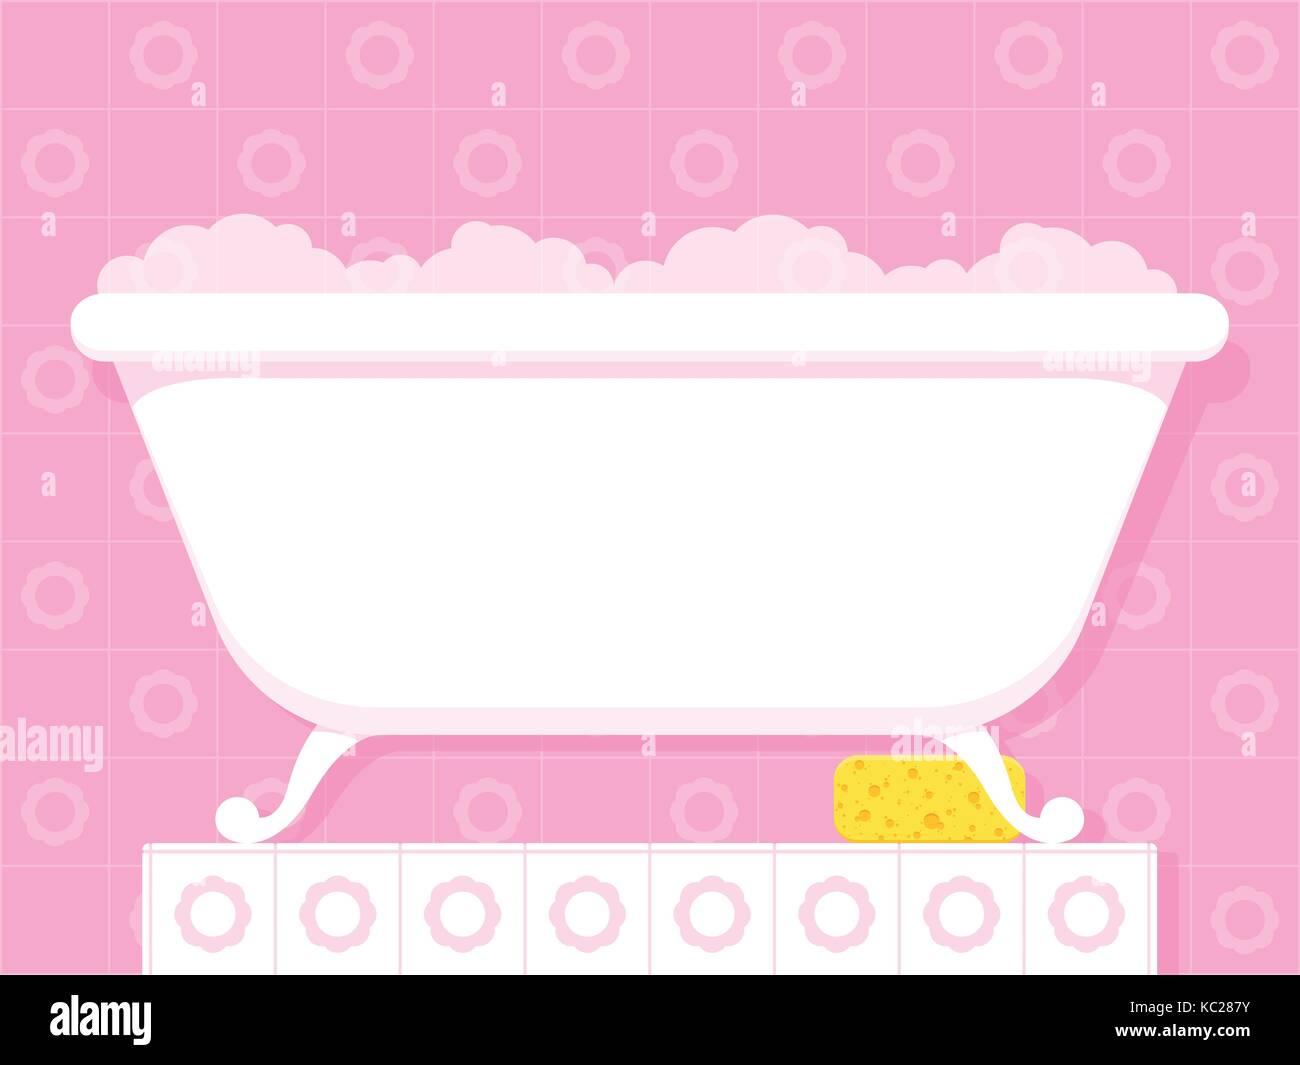 Bubble bath tub wit sponge - vector illustration Stock Vector Art ...